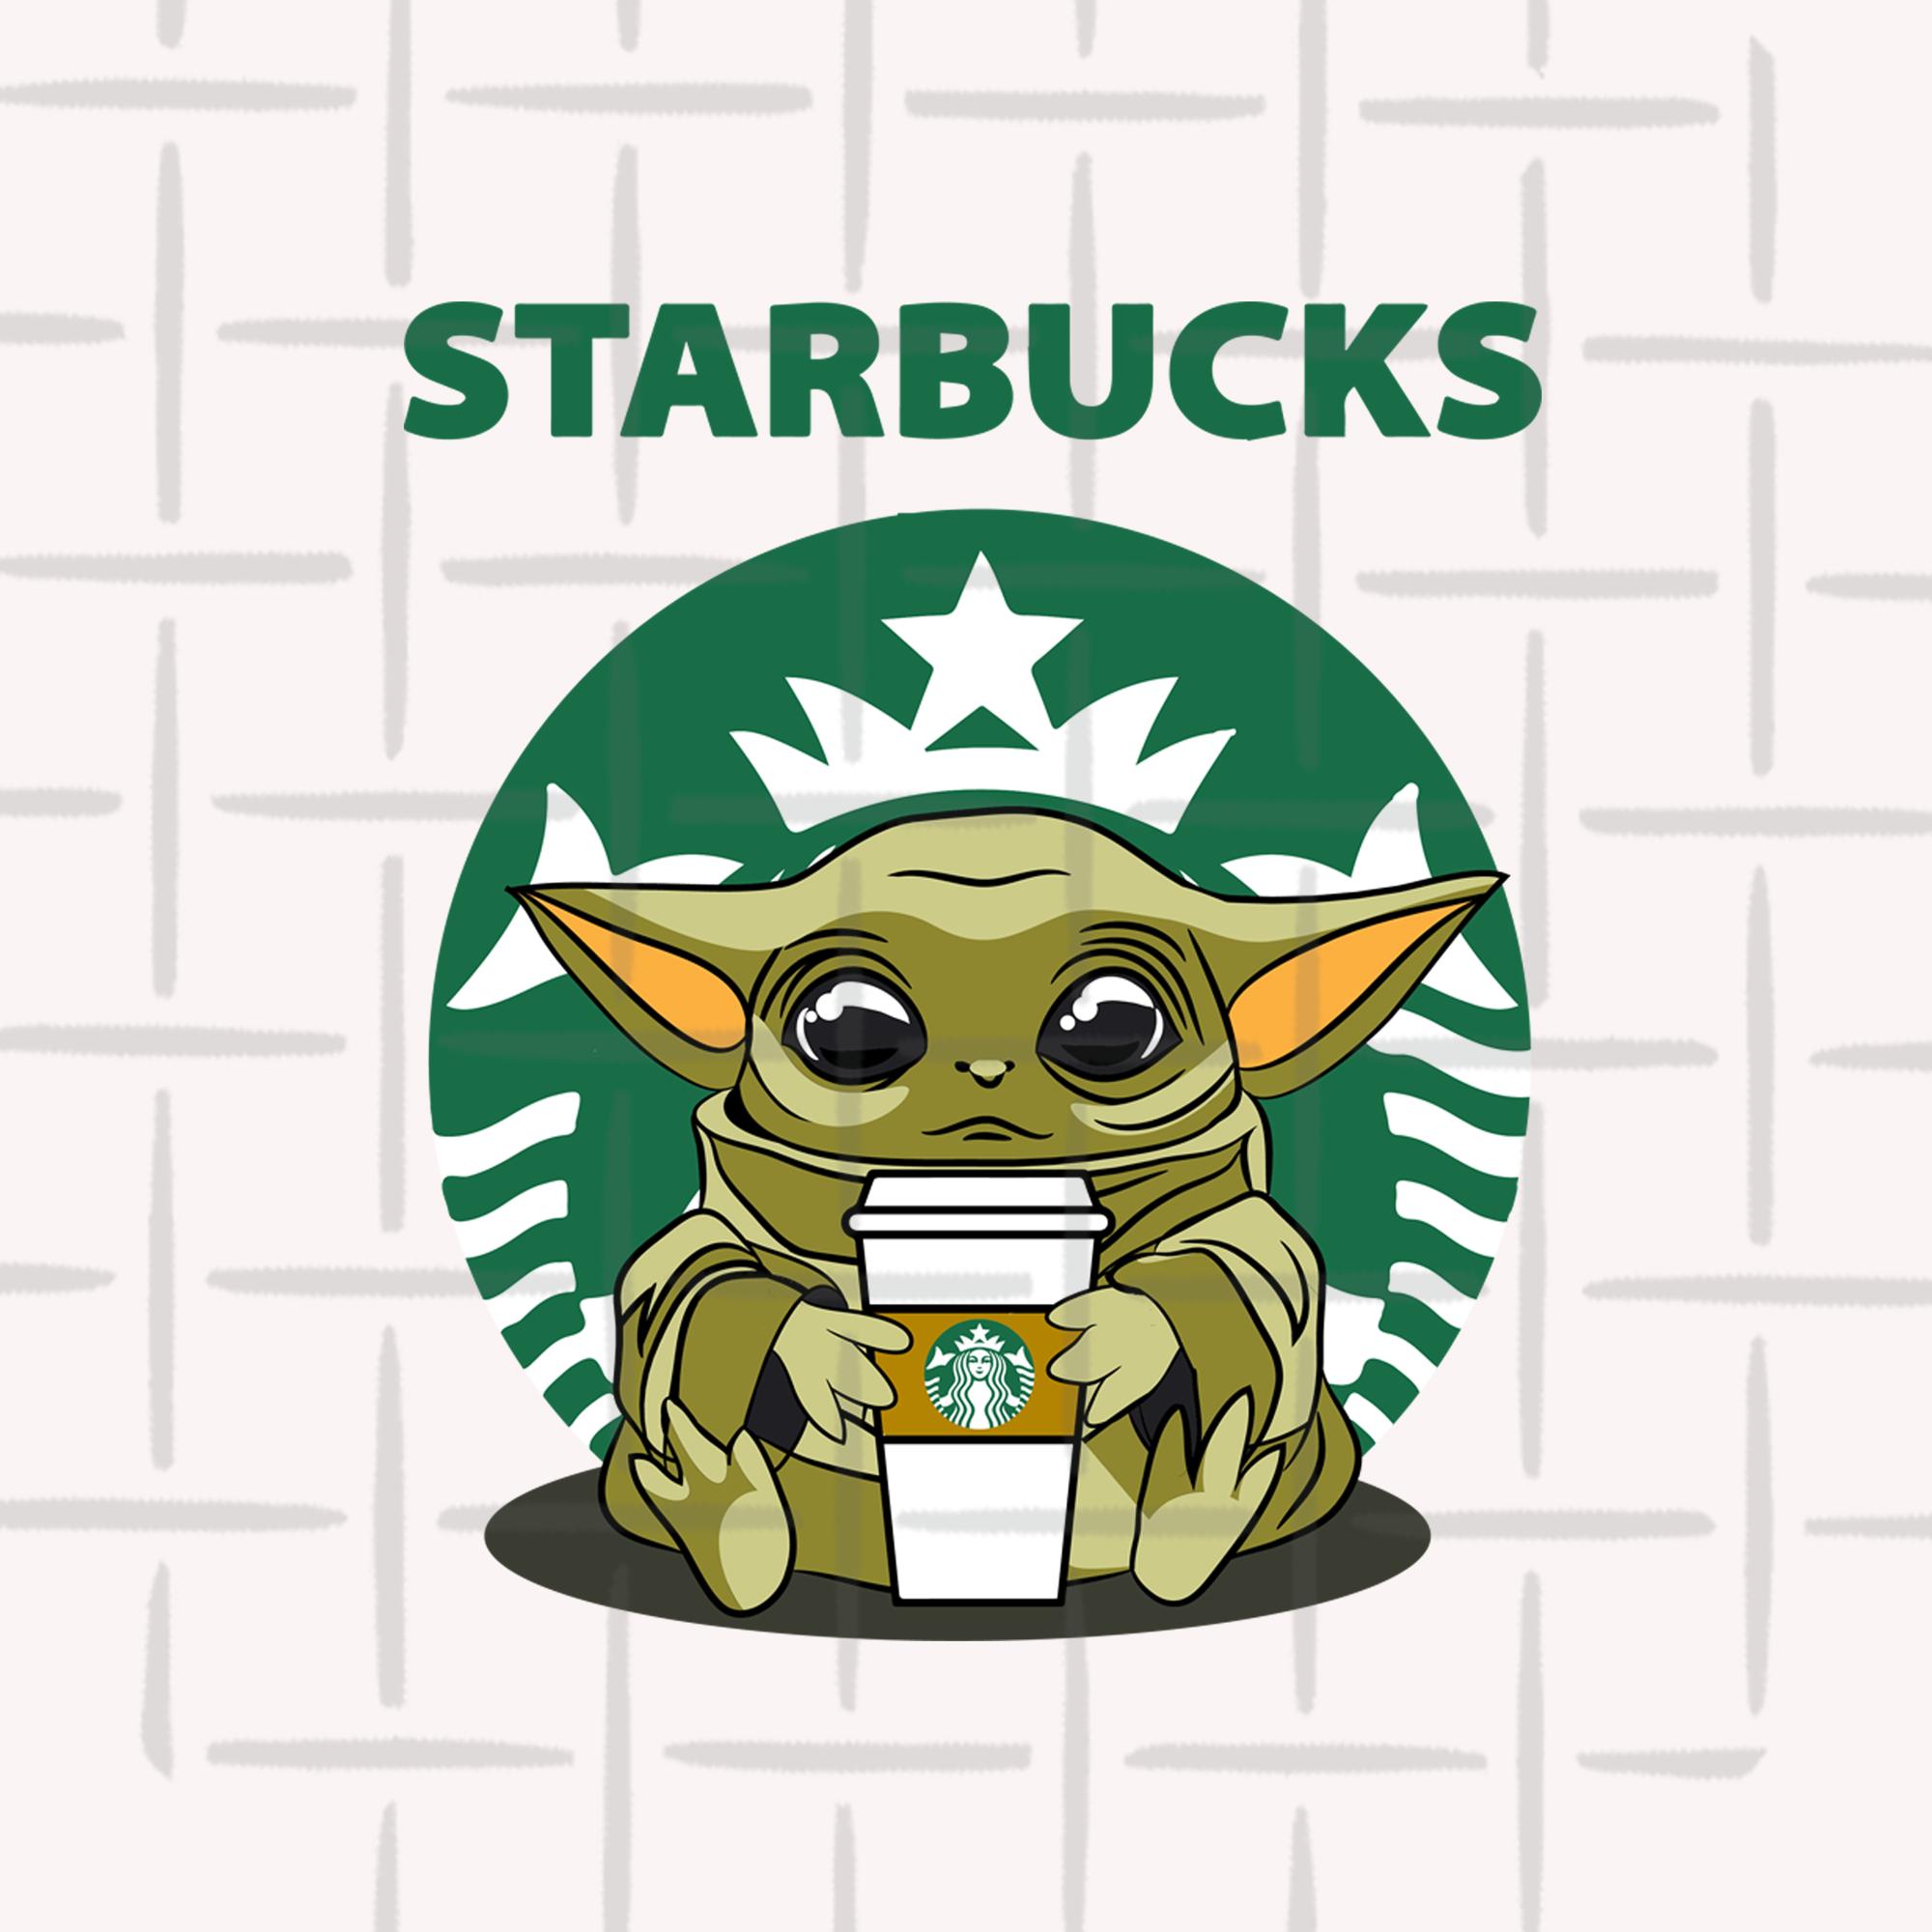 Baby Yoda Starbucks Svg Png Jpeg Starbucks Art Starbucks Wallpaper Cute Cartoon Wallpapers